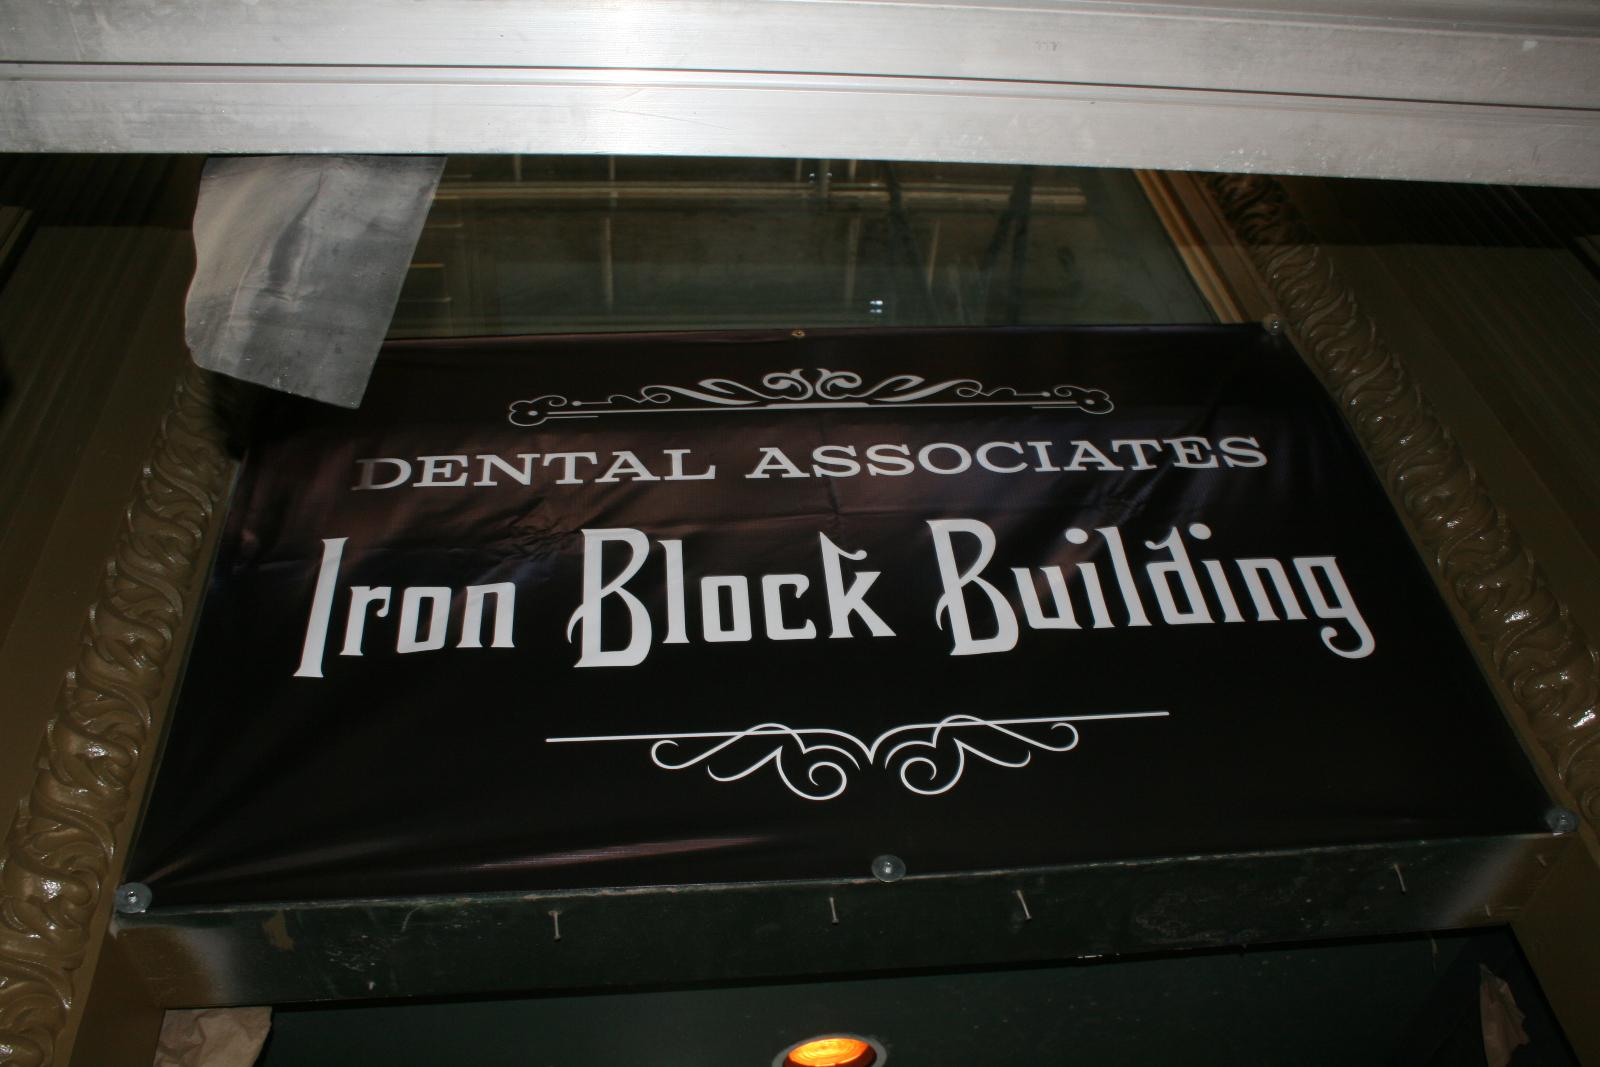 The Iron Block Building.